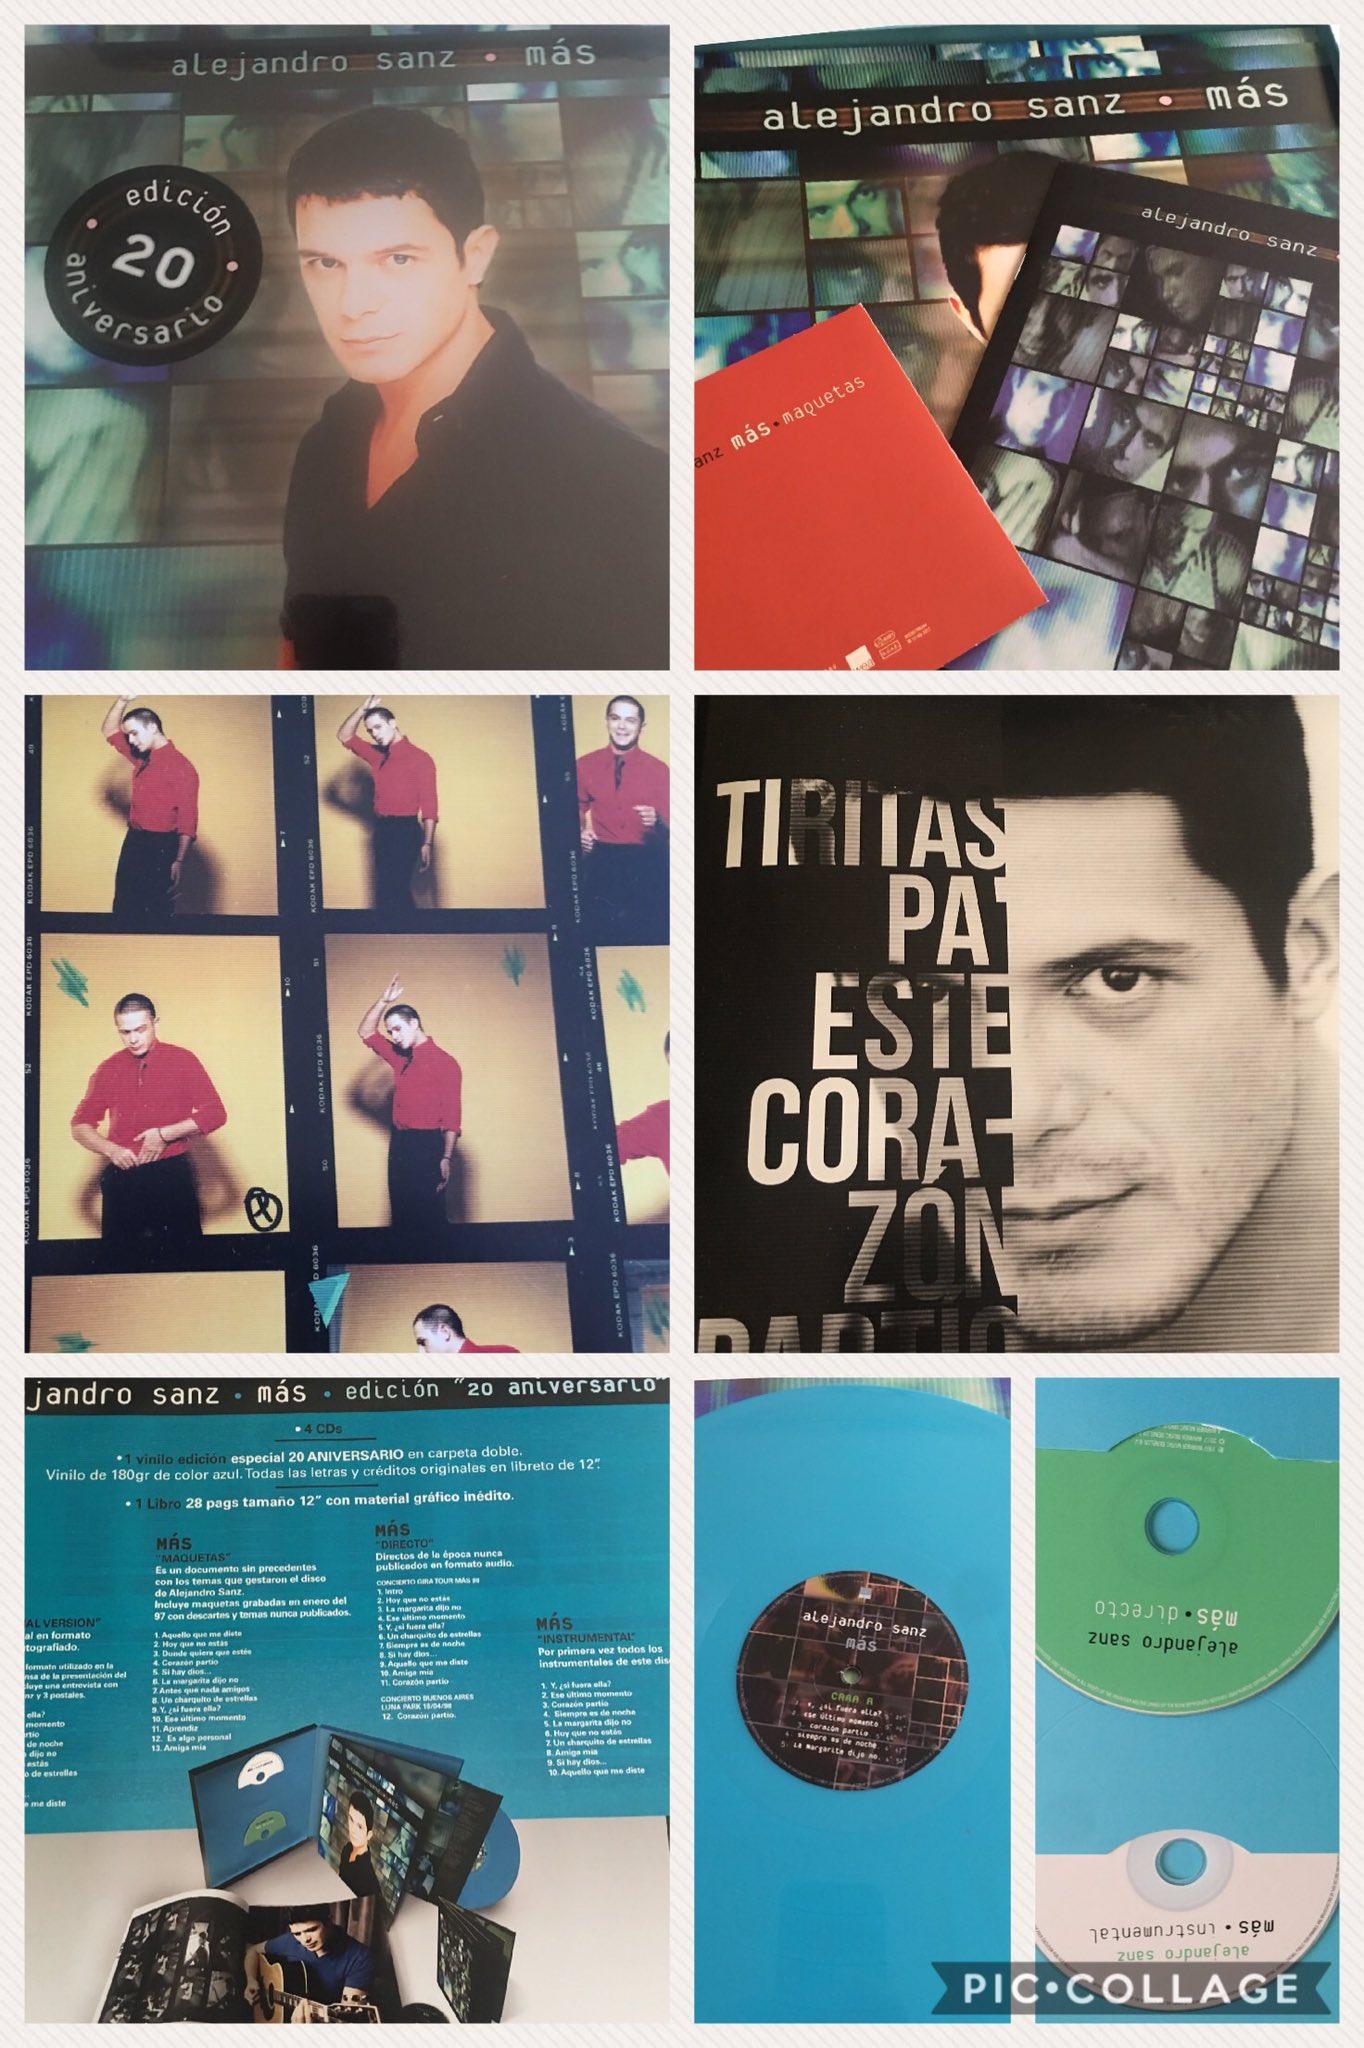 #RedUSA #AlejandroSanz #Más #20años #Colección Alejandro Sanz @ASanz_USA https://t.co/APPrdYEiHX